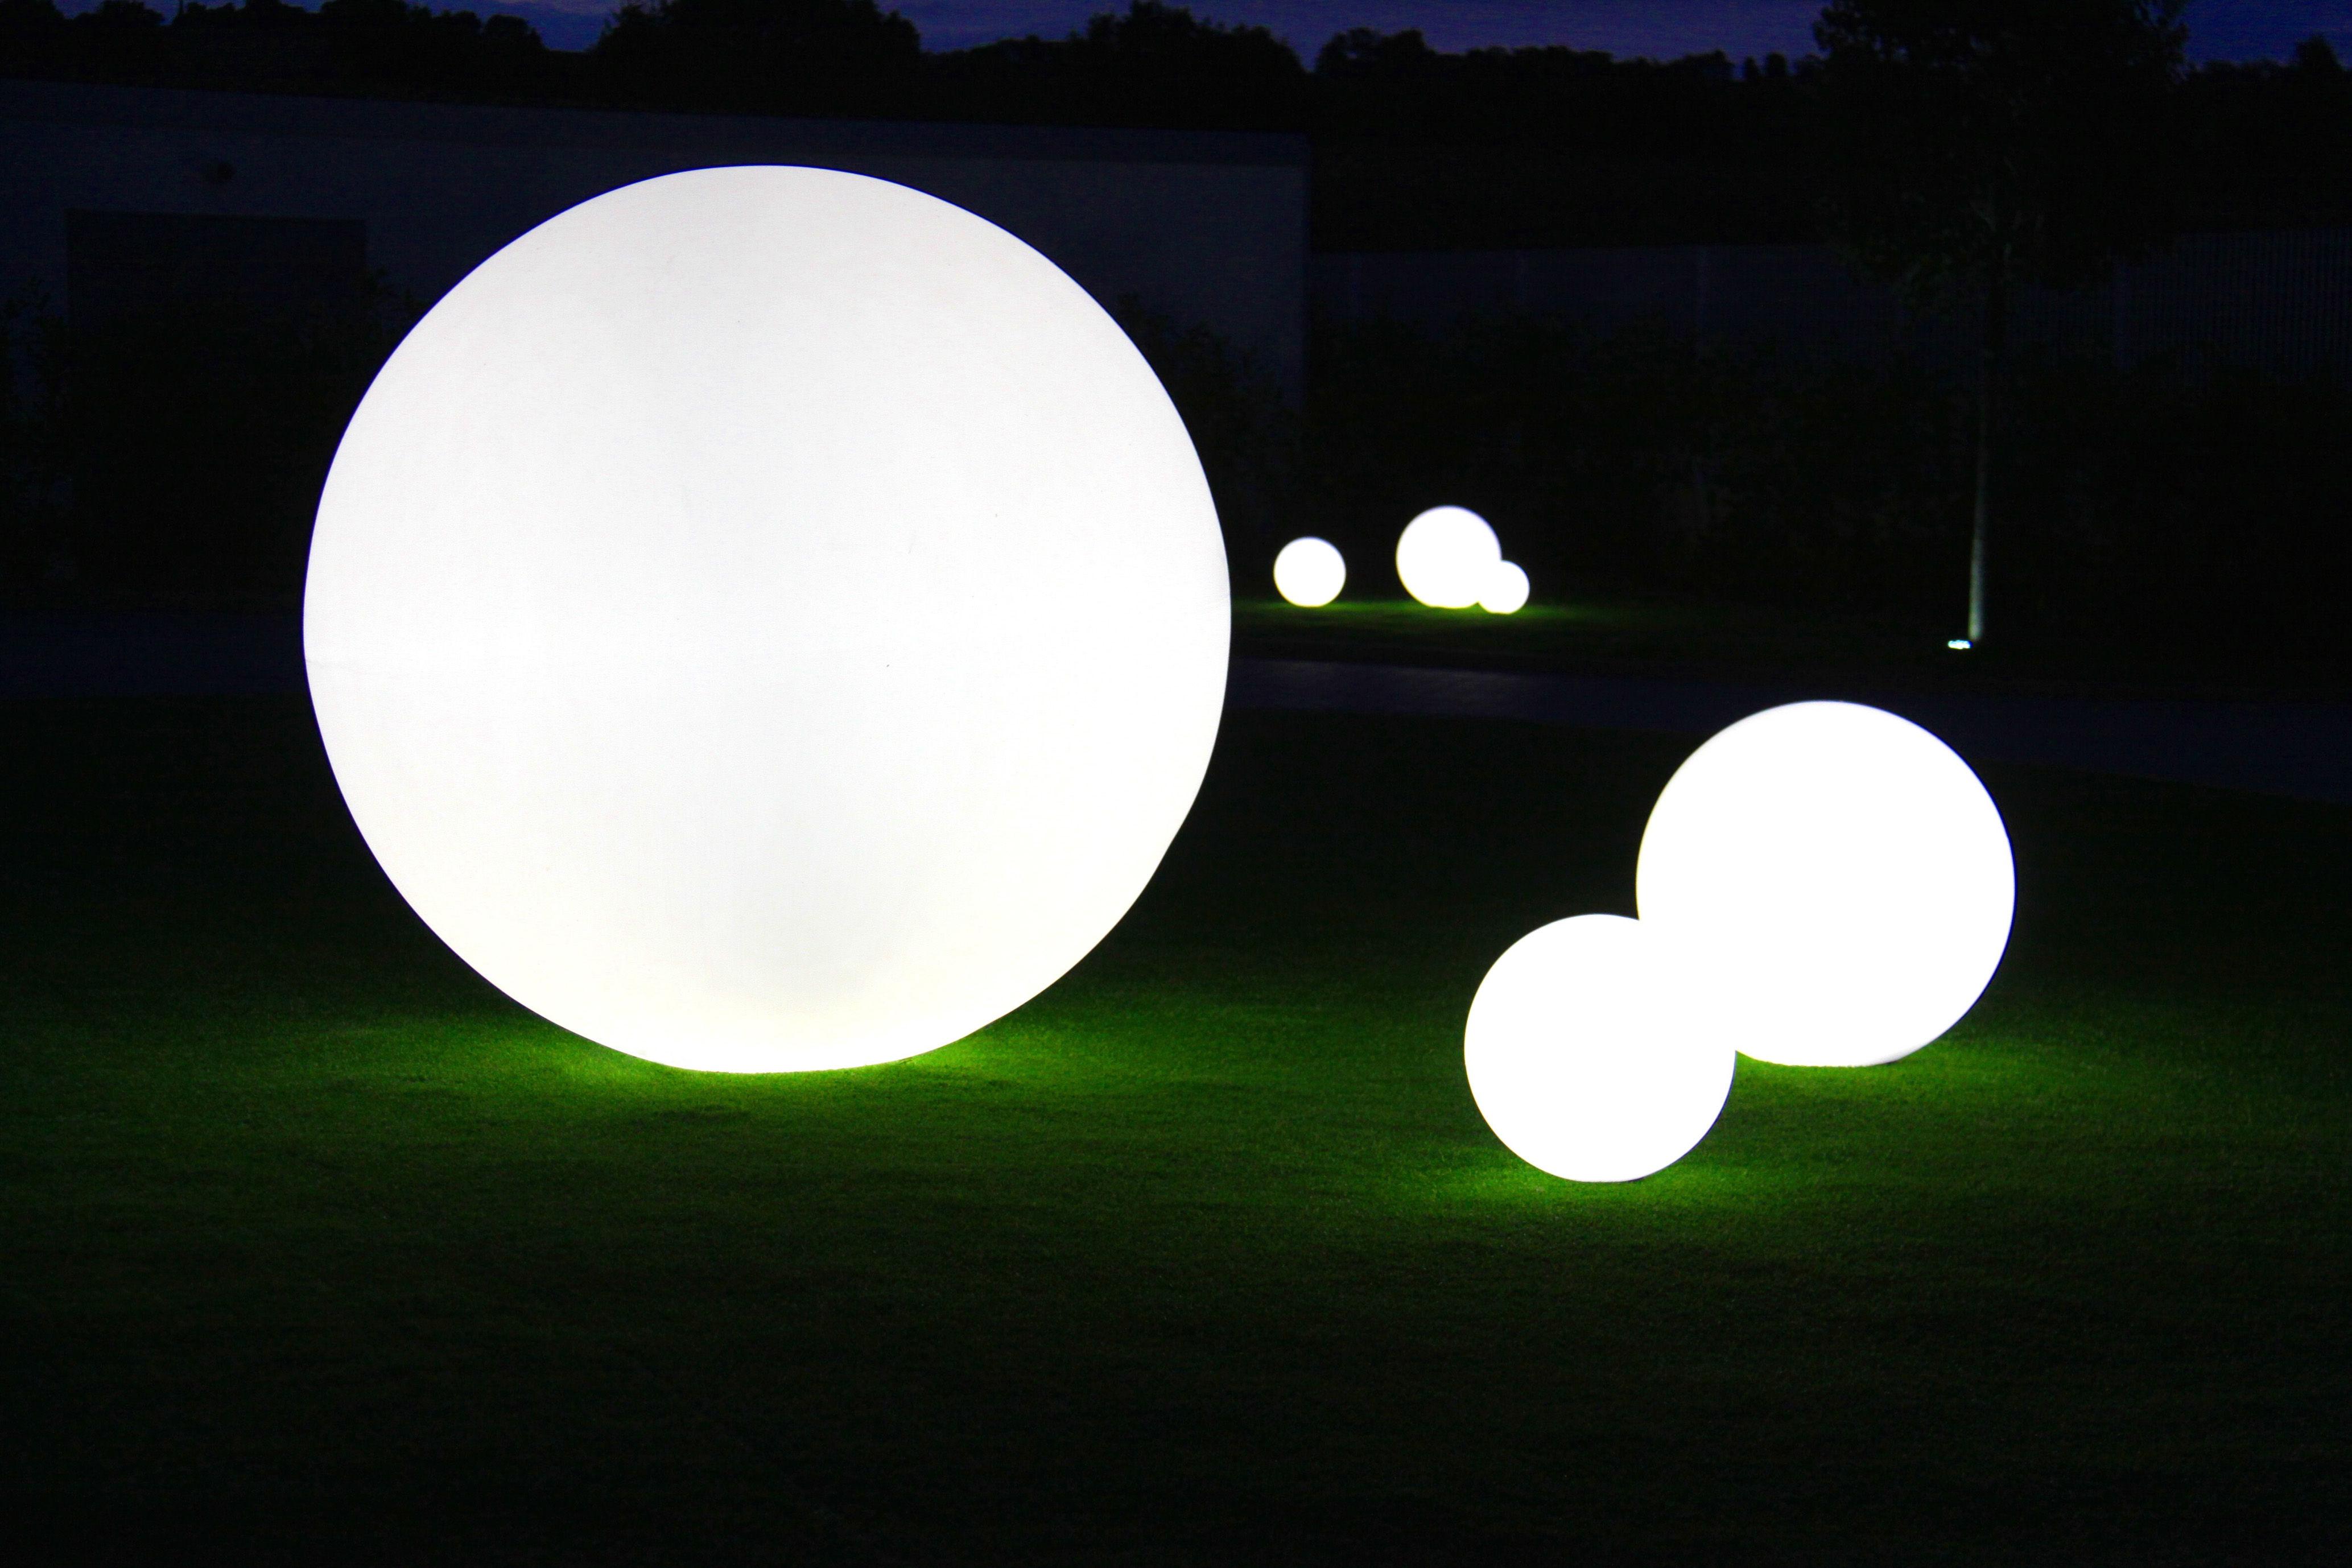 Globi illuminazione per esterni ginnasticalmajuventusfano